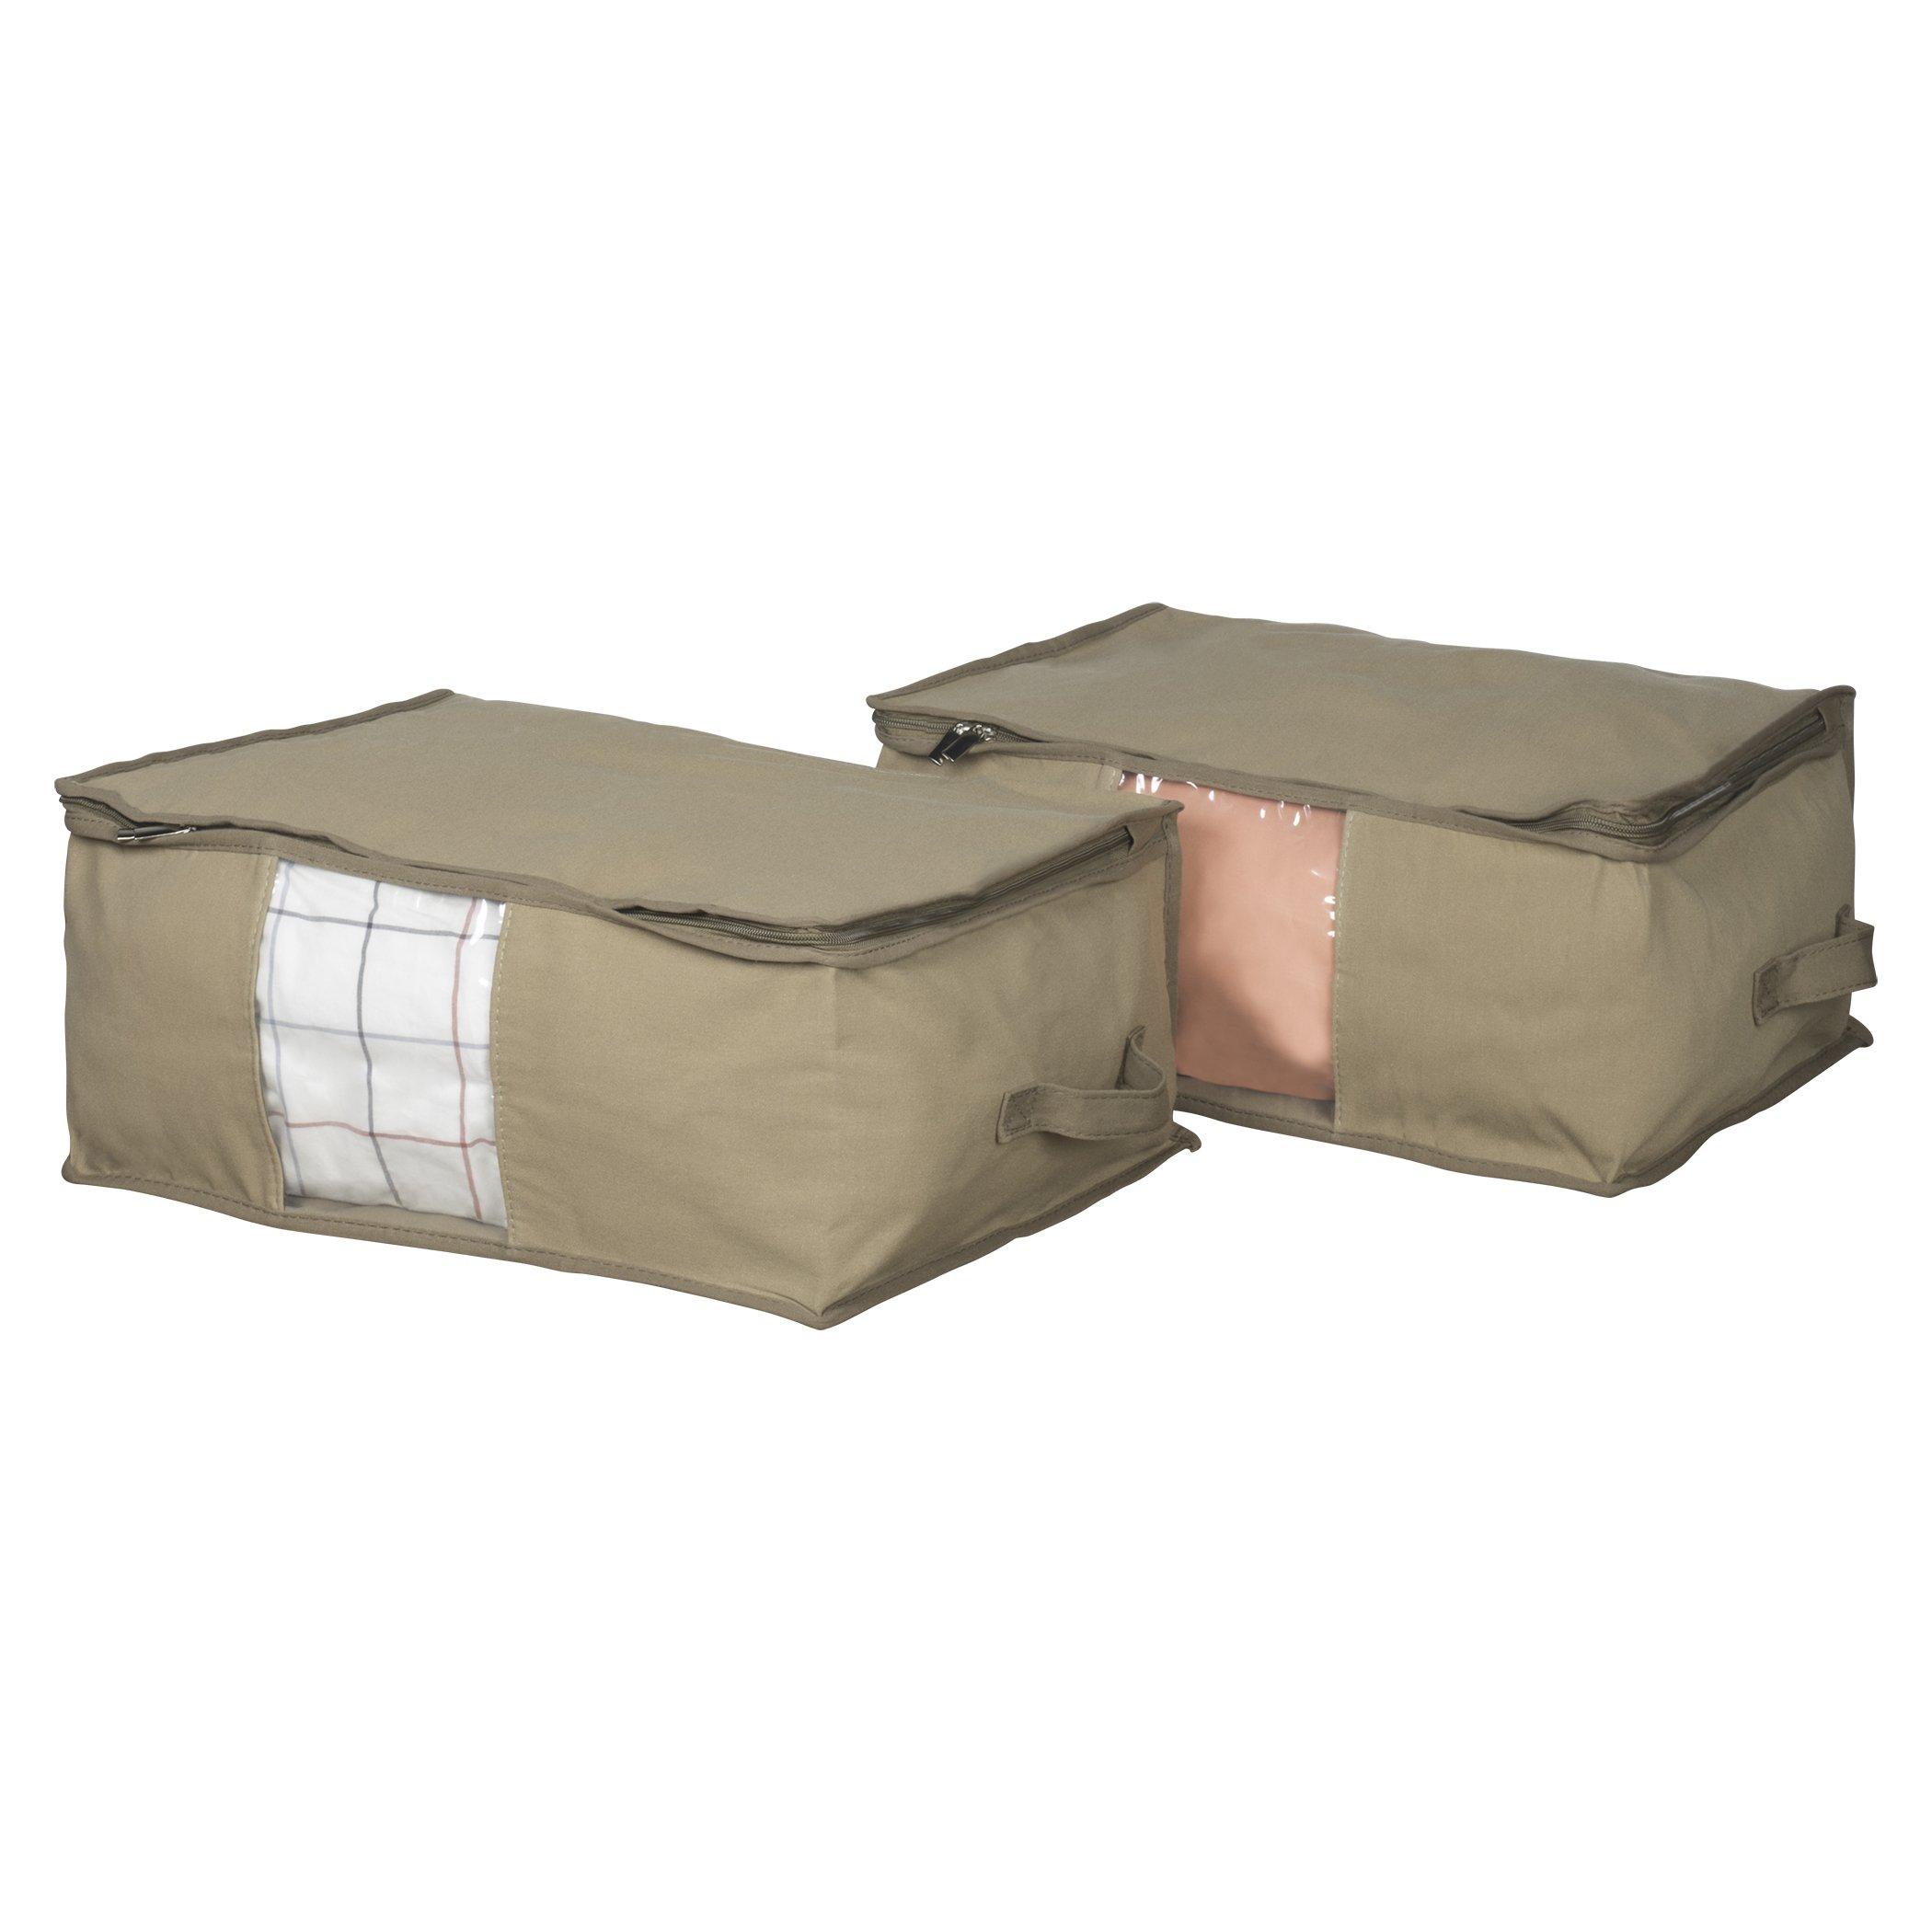 Richards Homewares Cedar Storage Bags, 18 x 14 x 8-Inch (1-Pack of 2)